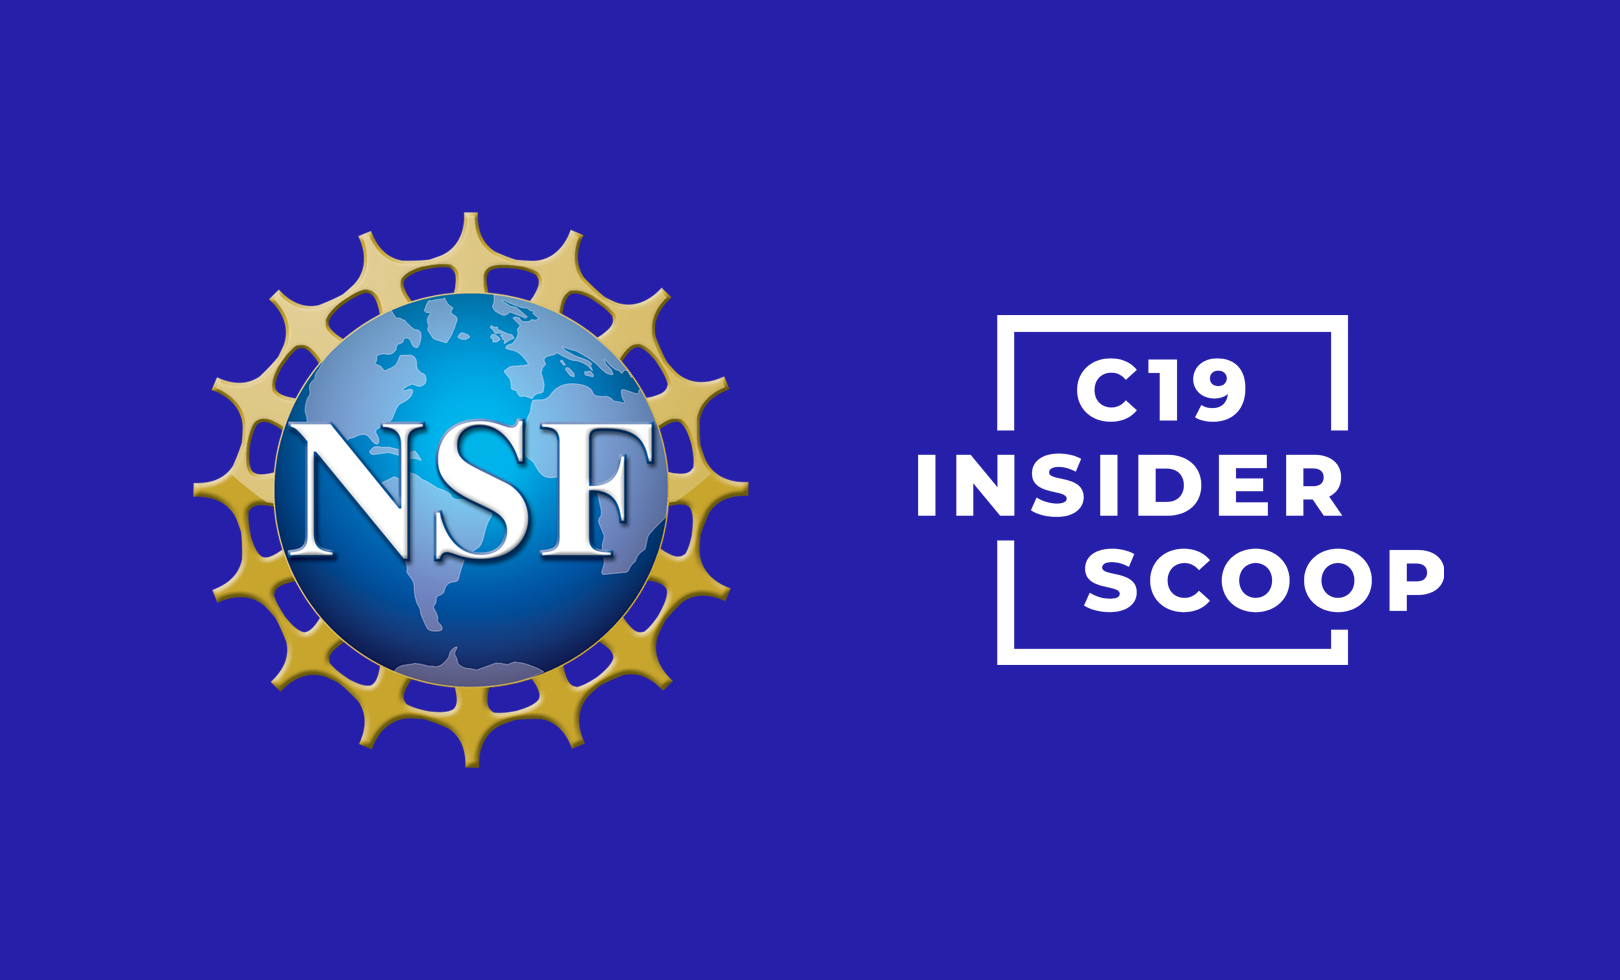 Left: NSF logo, Right: C19 Insider Scoop Logo